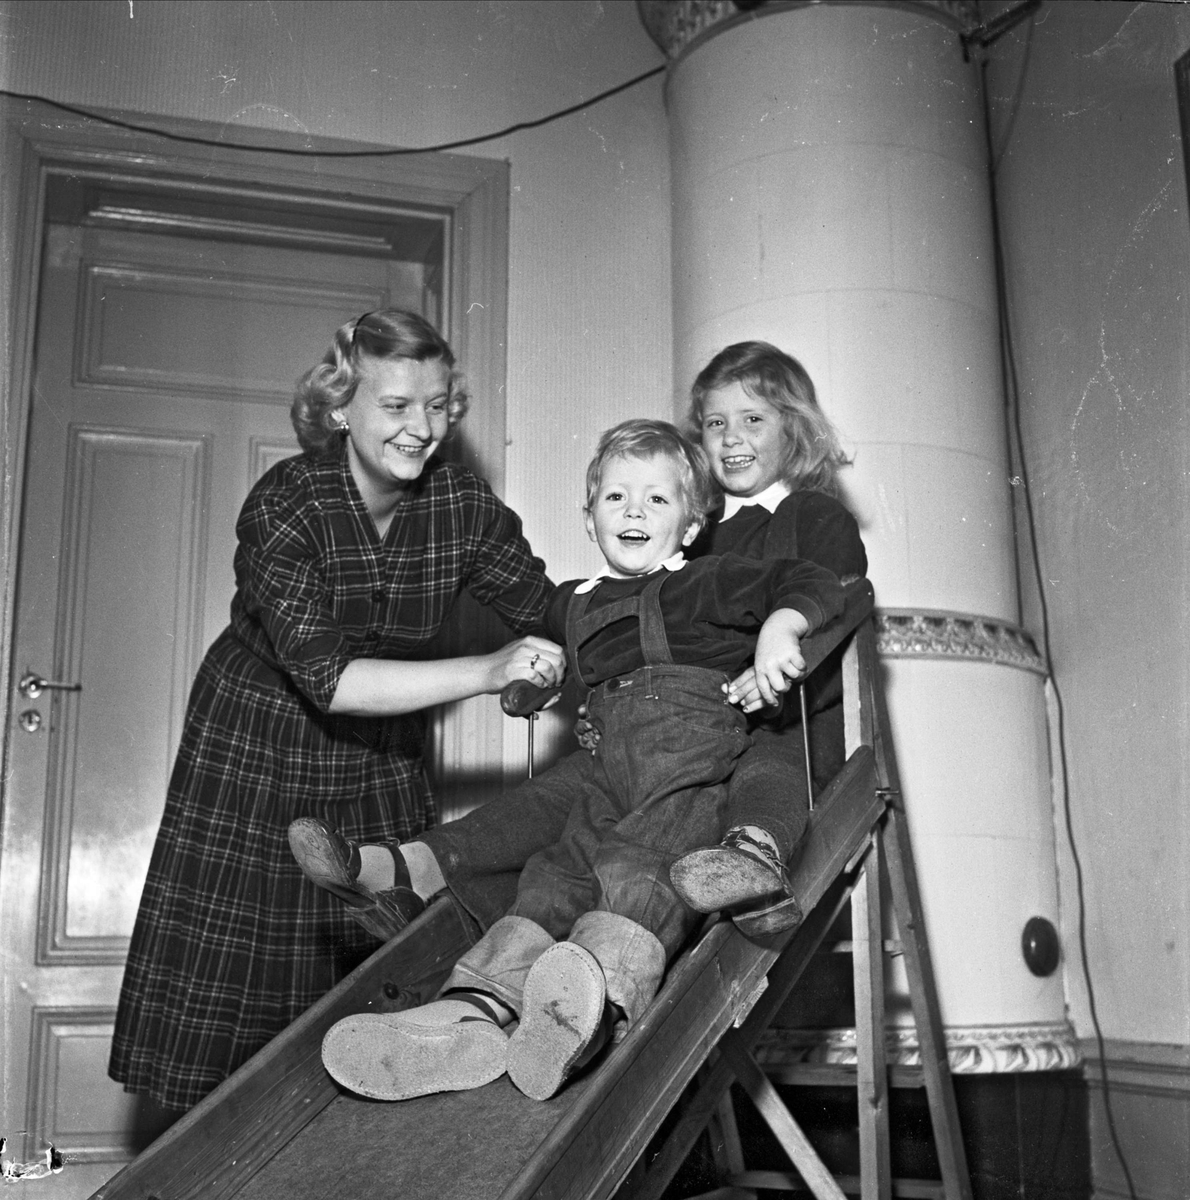 Barn åker rutschkana, april 1955